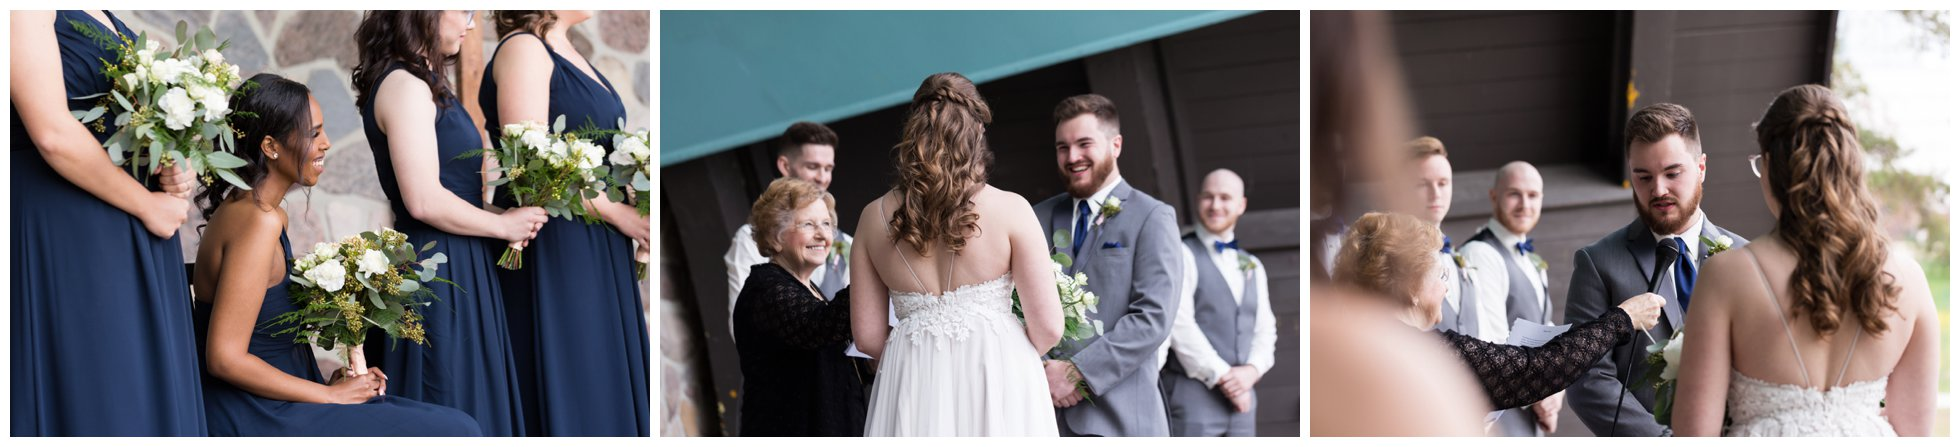 Emily and Royden Edmonton Wedding (Life by Selena Photography)_0008.jpg